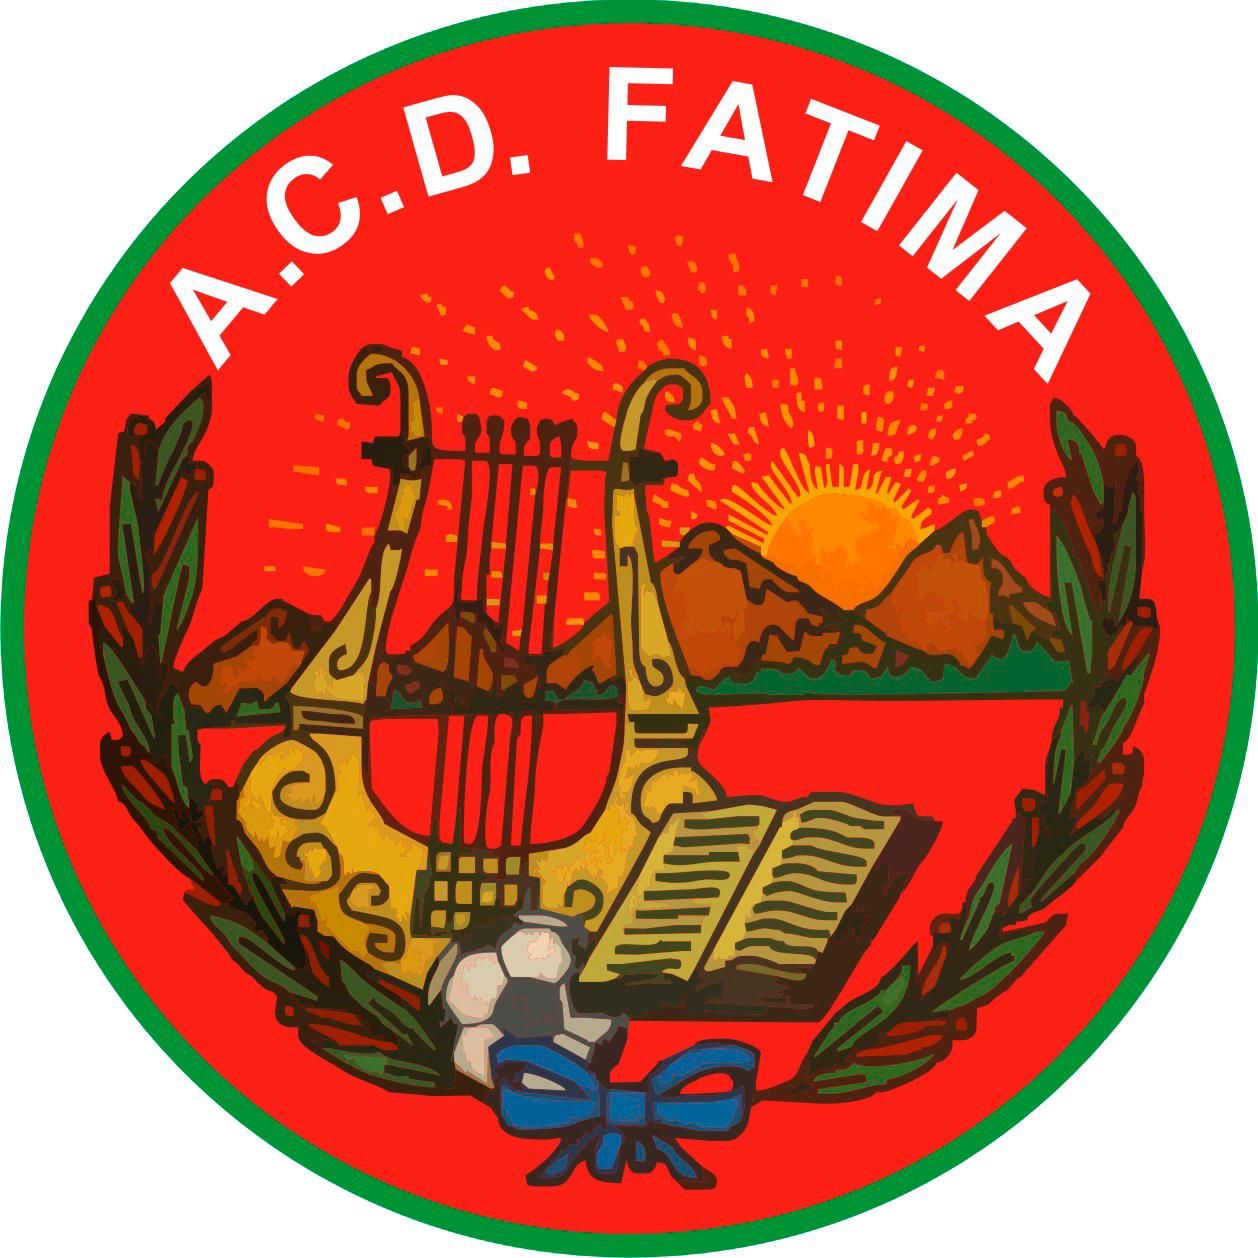 acdfatima